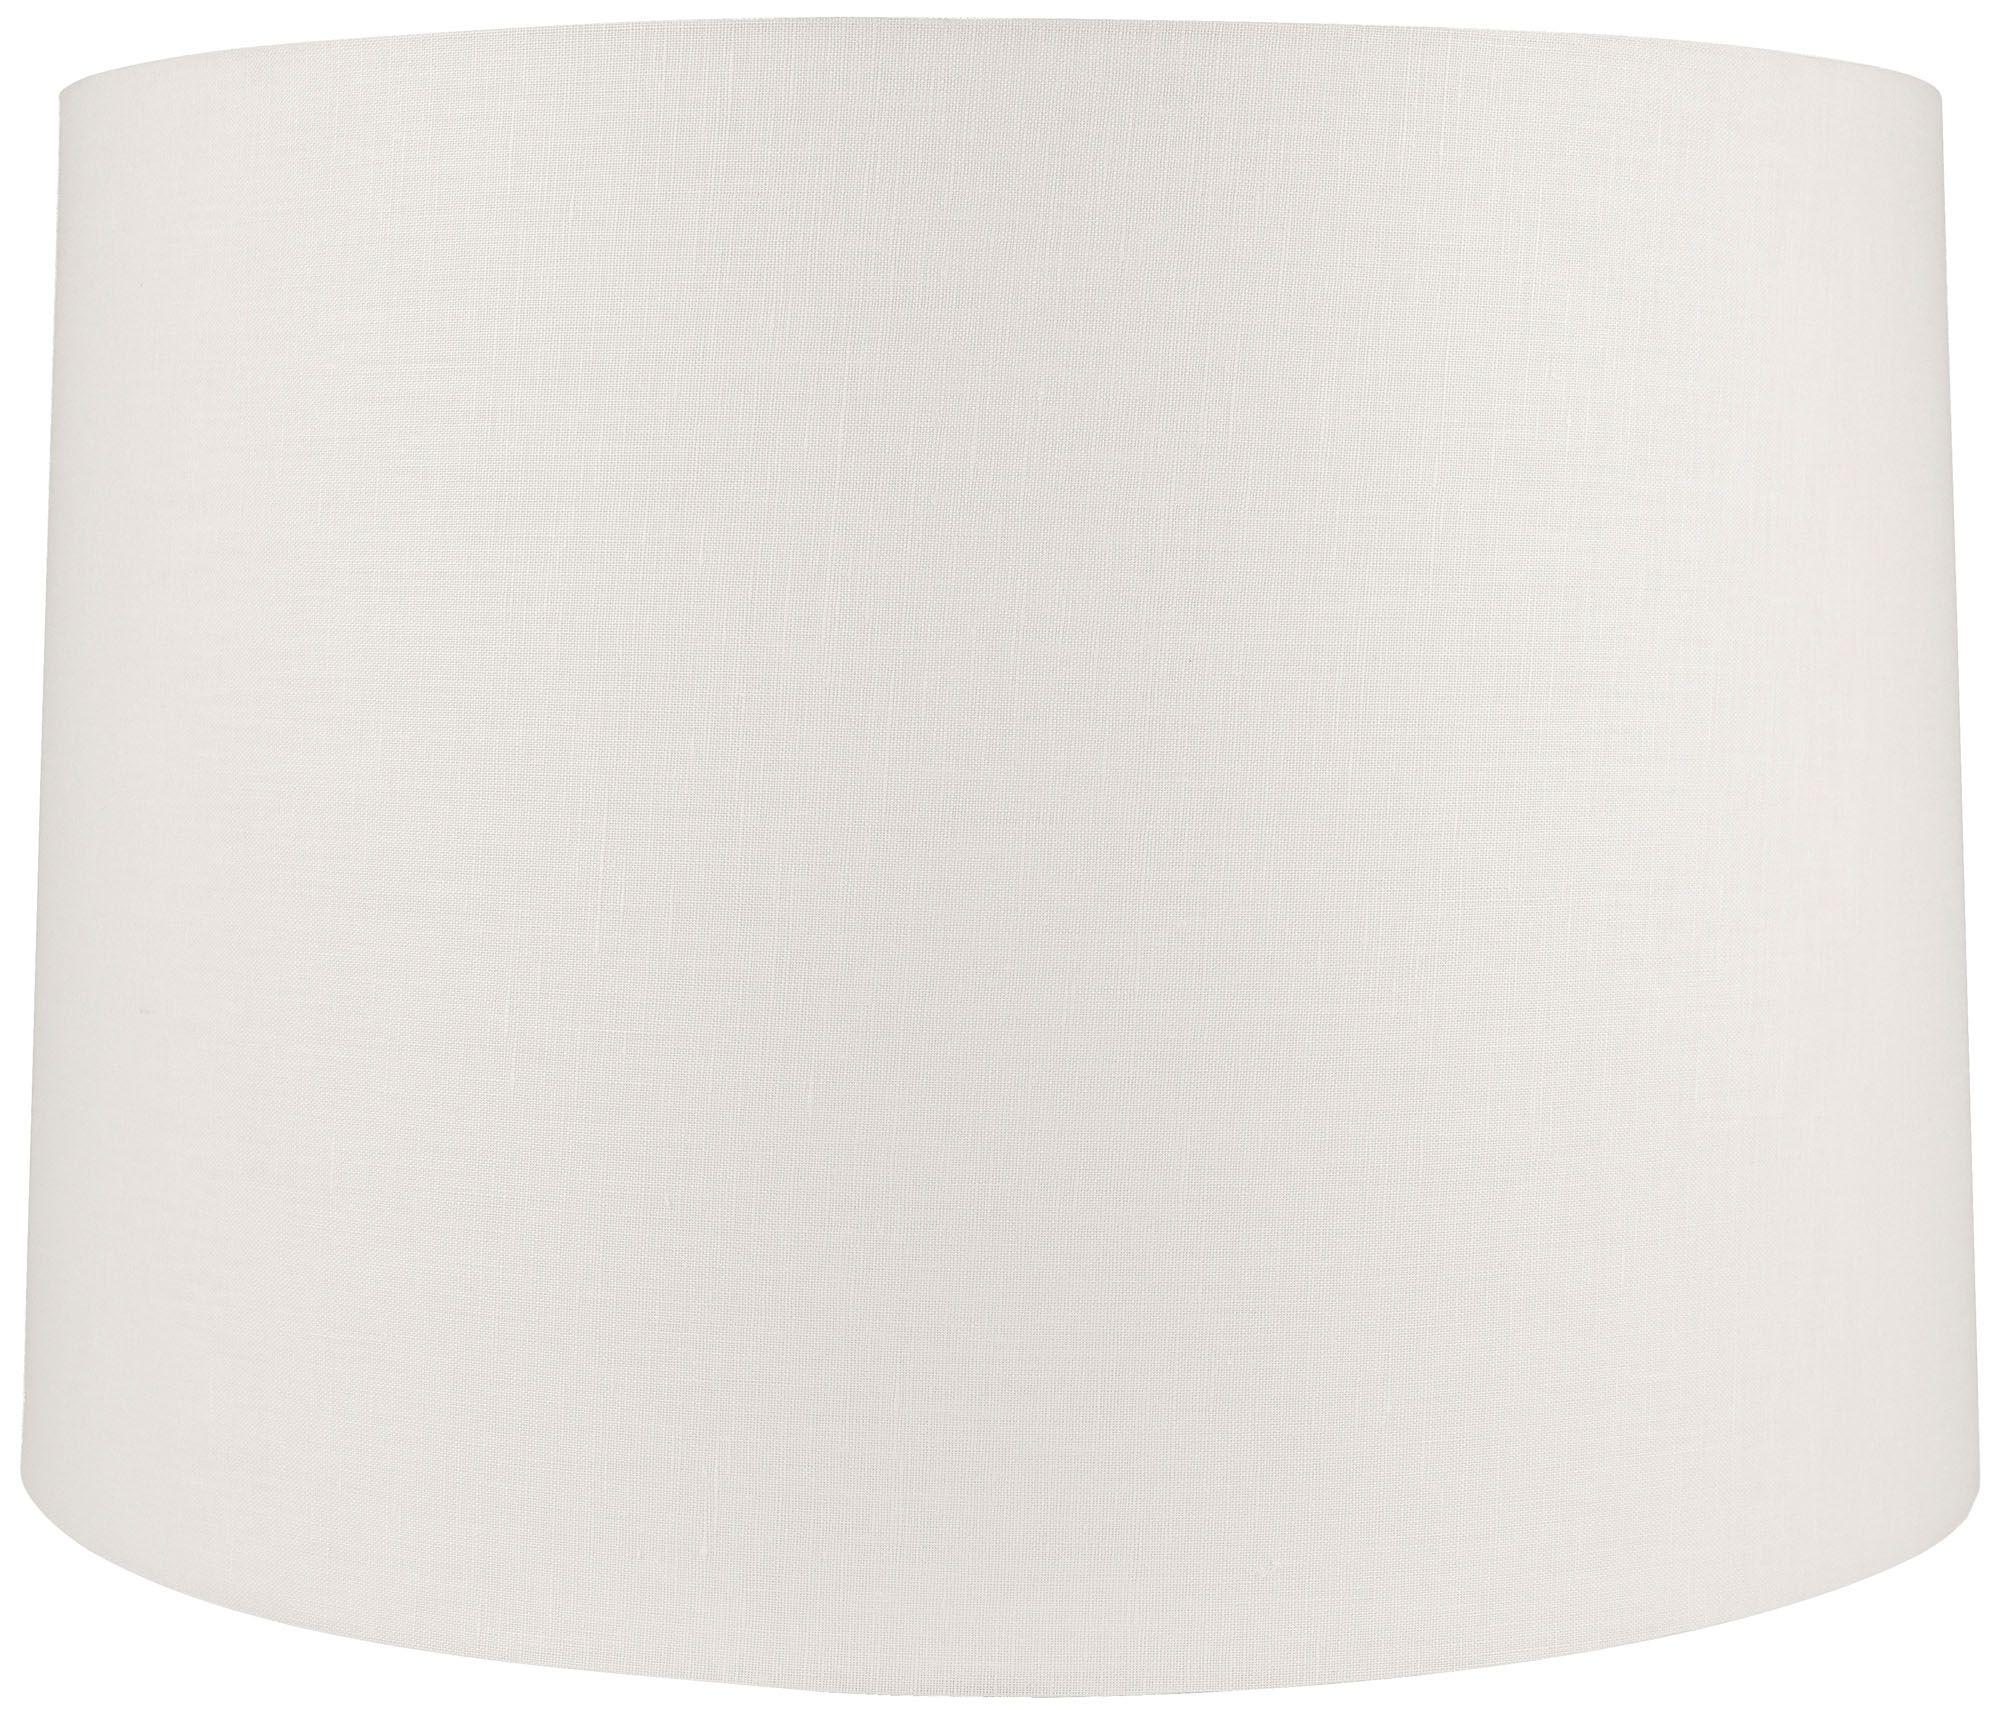 white linen hardback drum lamp shade 17x20x13 spider - Rectangular Lamp Shades